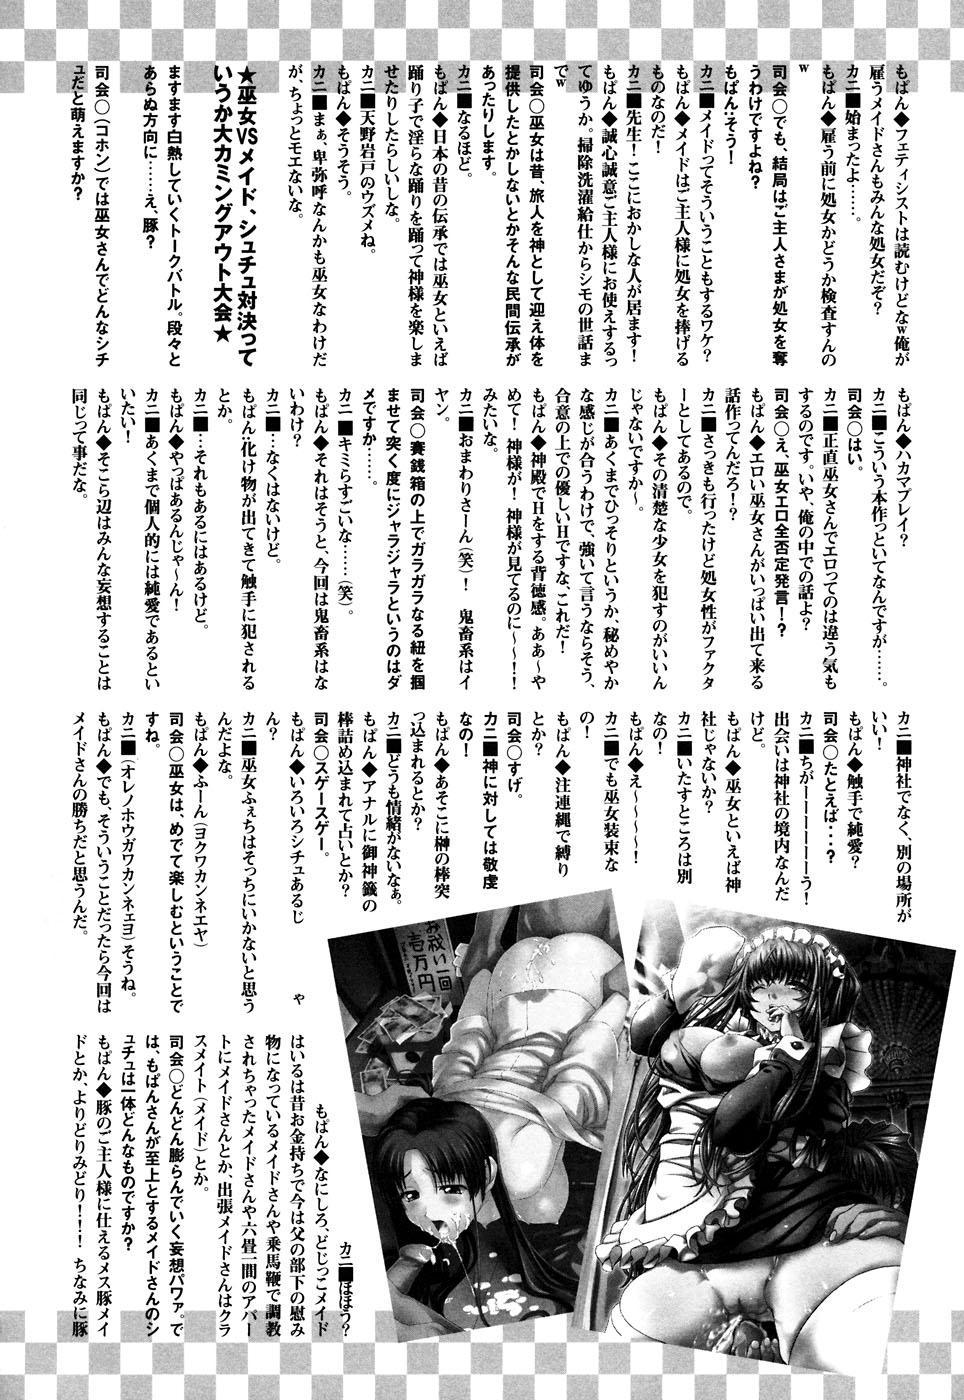 Fechikko VS Series ROUND.2 Miko San VS Maid San 164